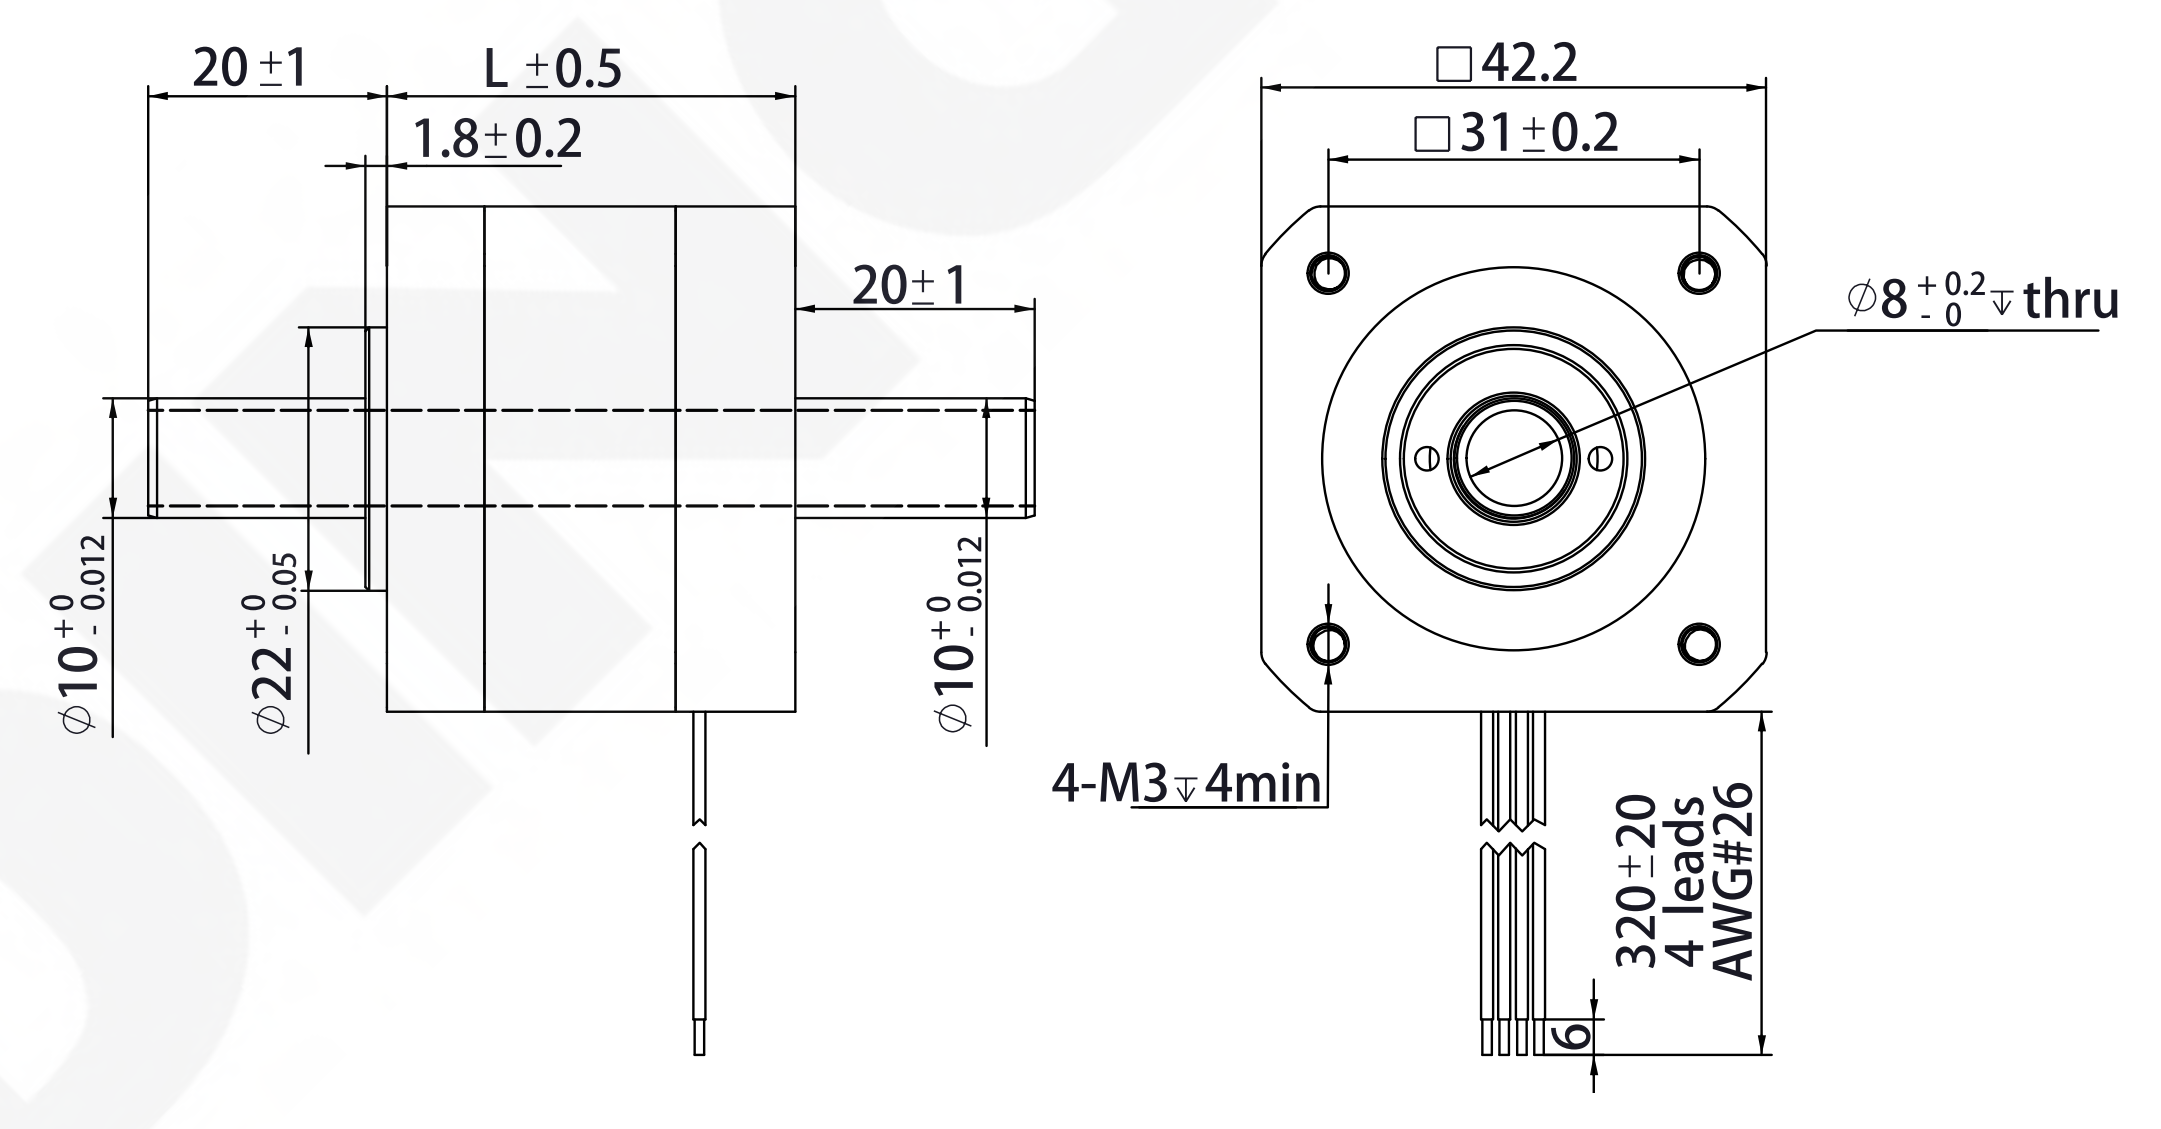 NEMA 17 Hollow Shaft Motor Drawing